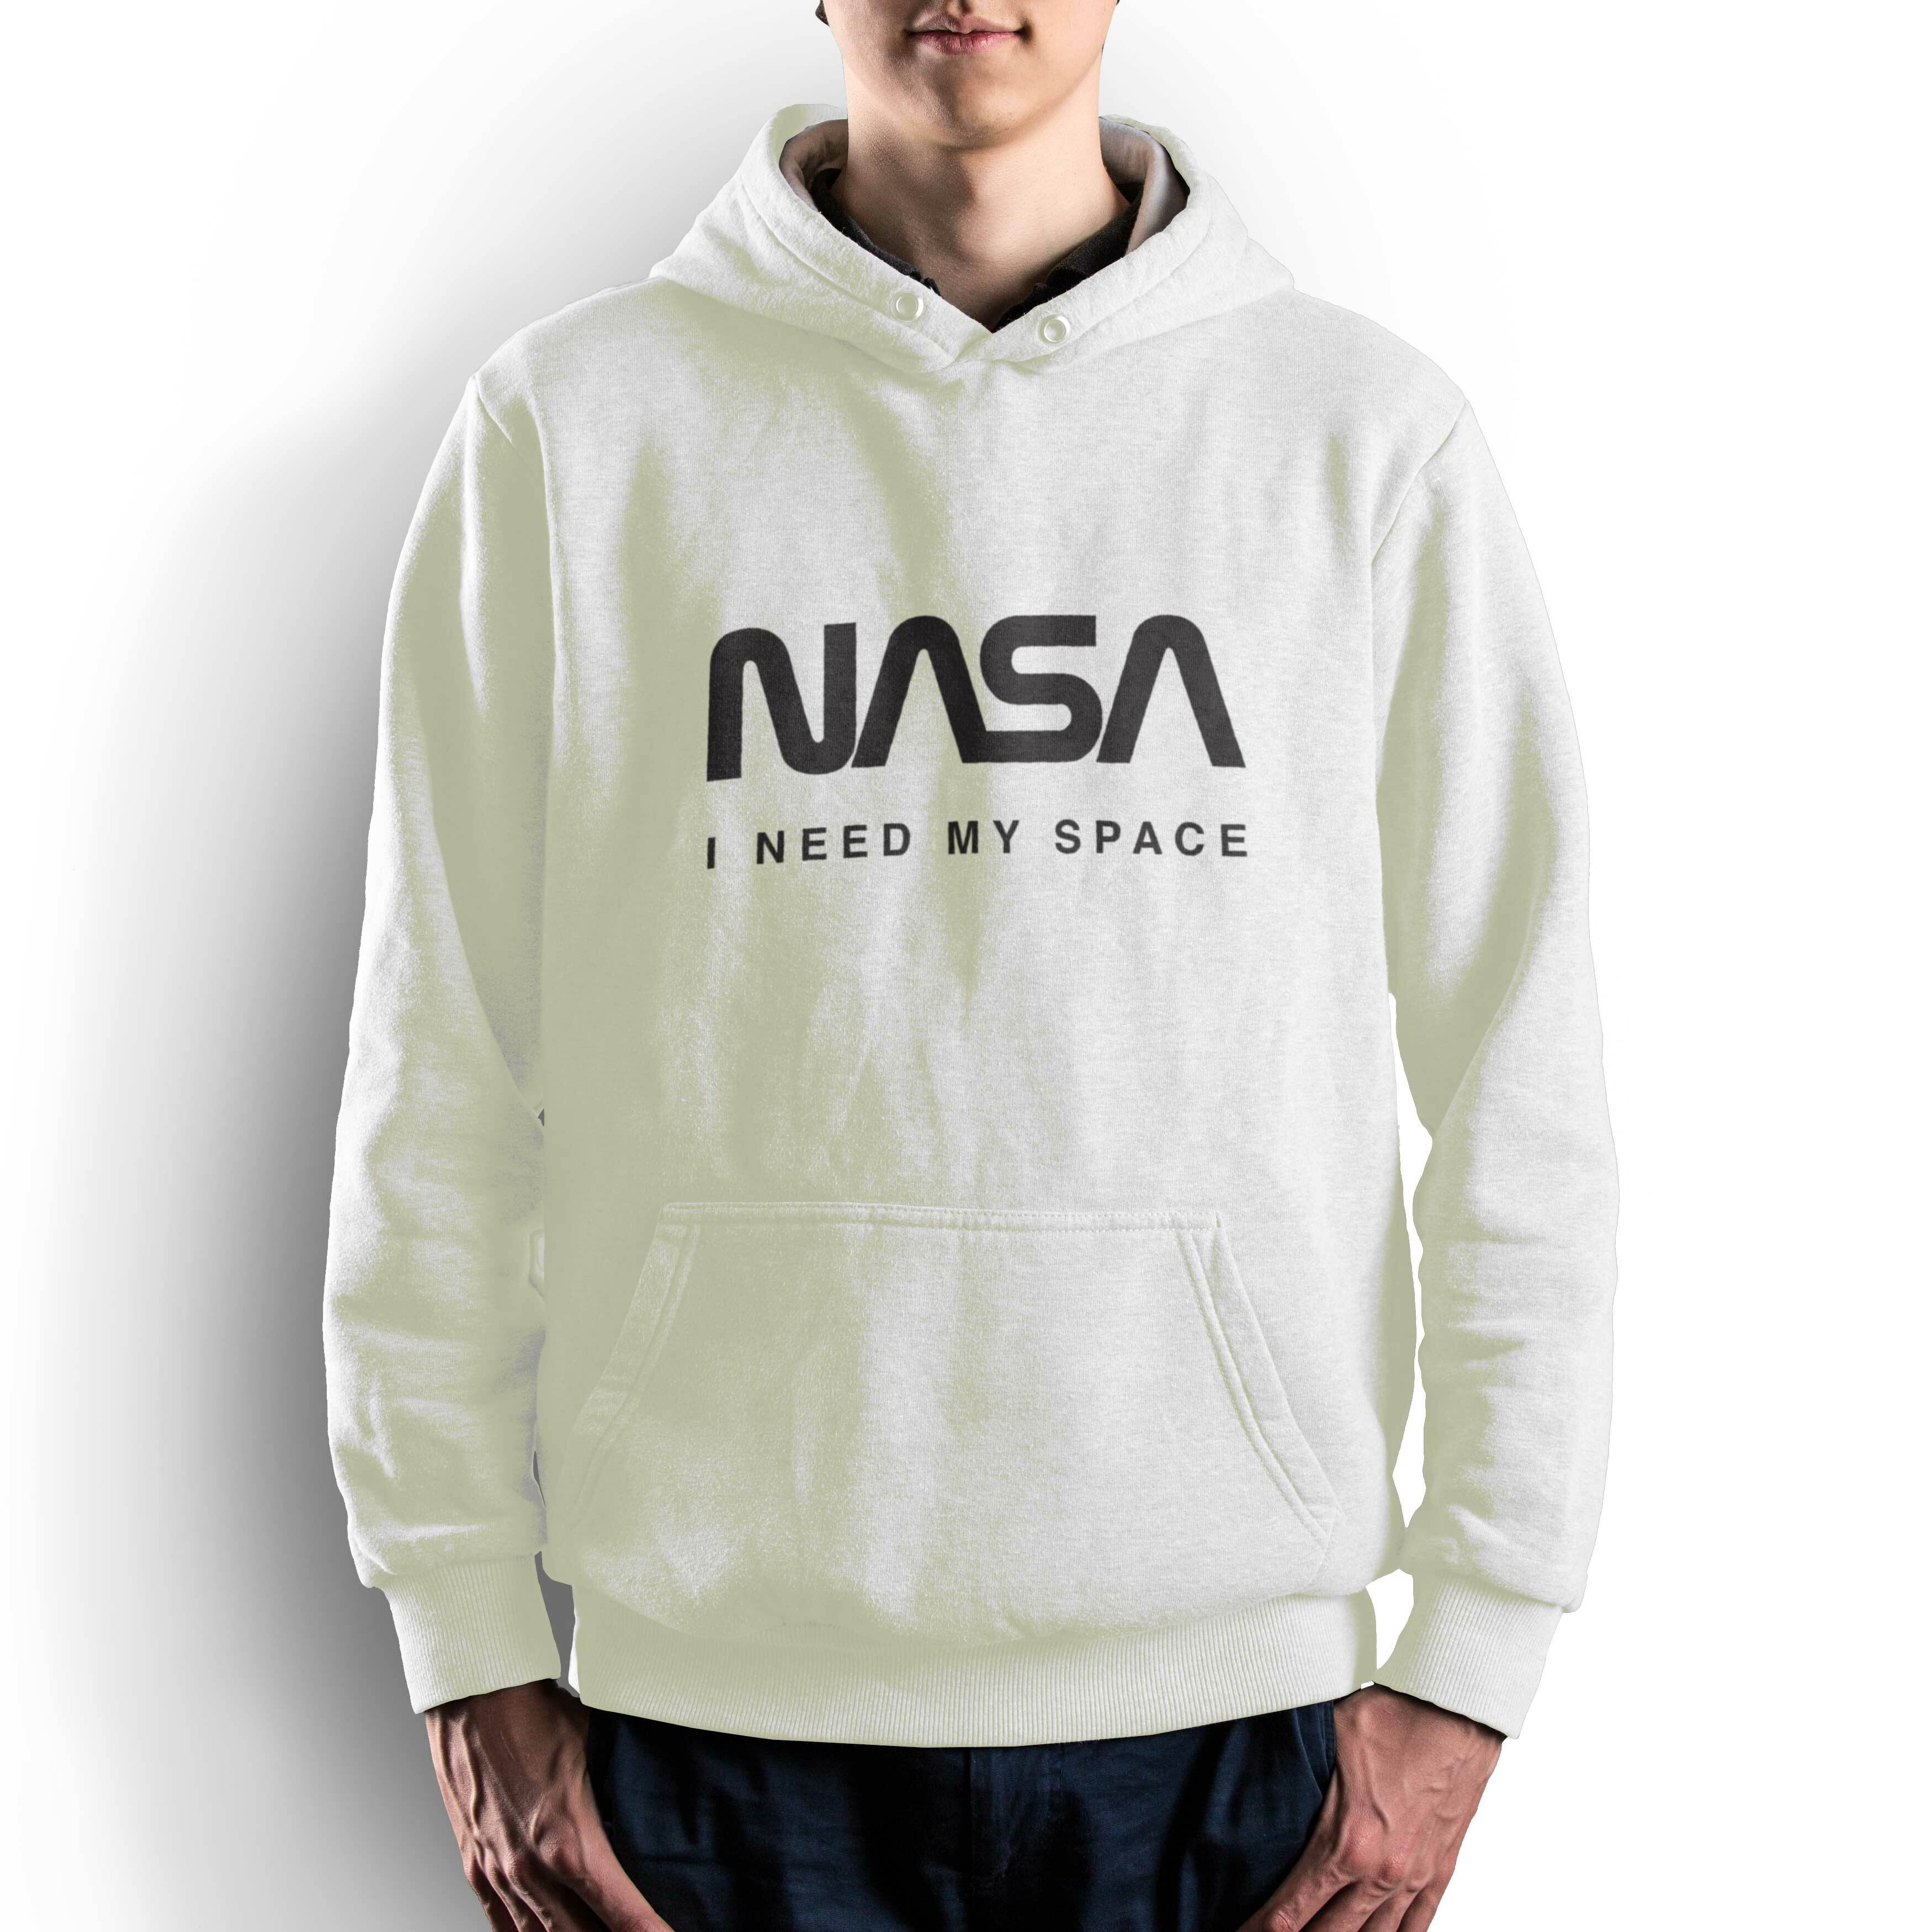 NASA公認(アメリカ航空宇宙局)・パーカー・JERZEES(ジャージーズ)ボディ・ロゴタイプ(ワーム)・ホワイト